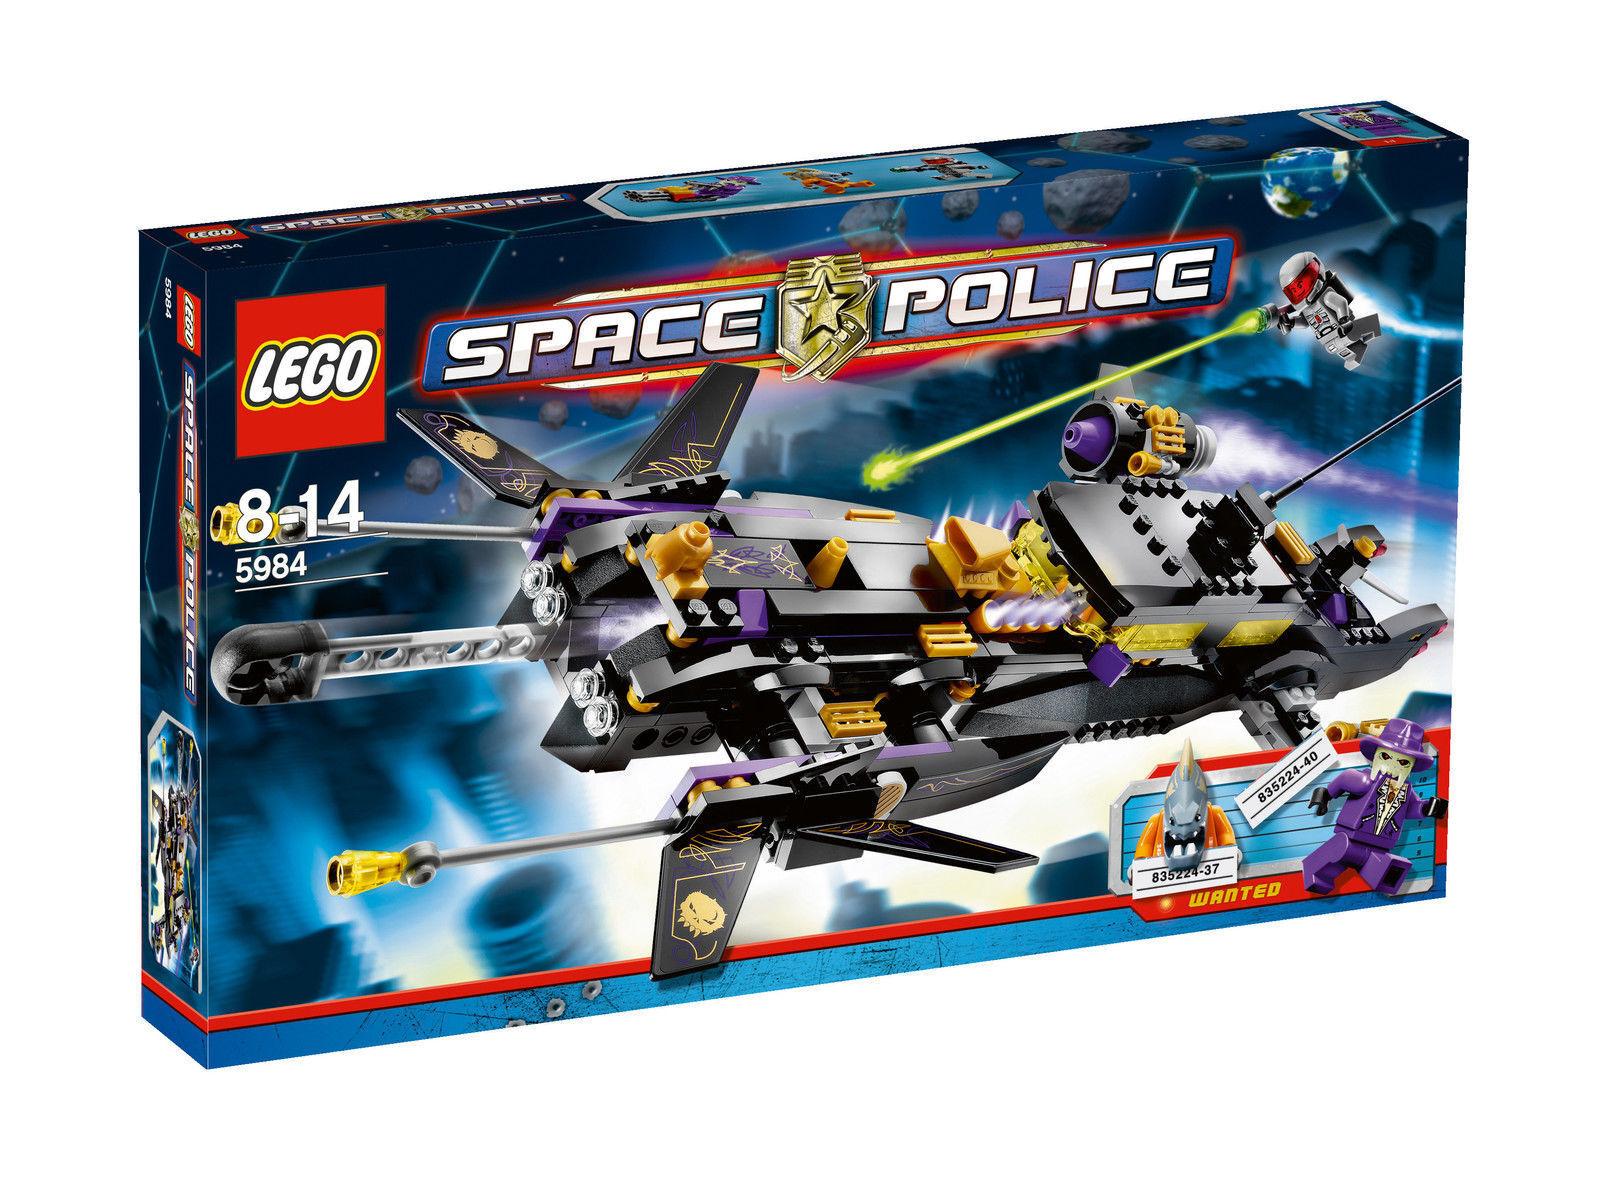 LEGO Space Police Mond-Limousine (5984)